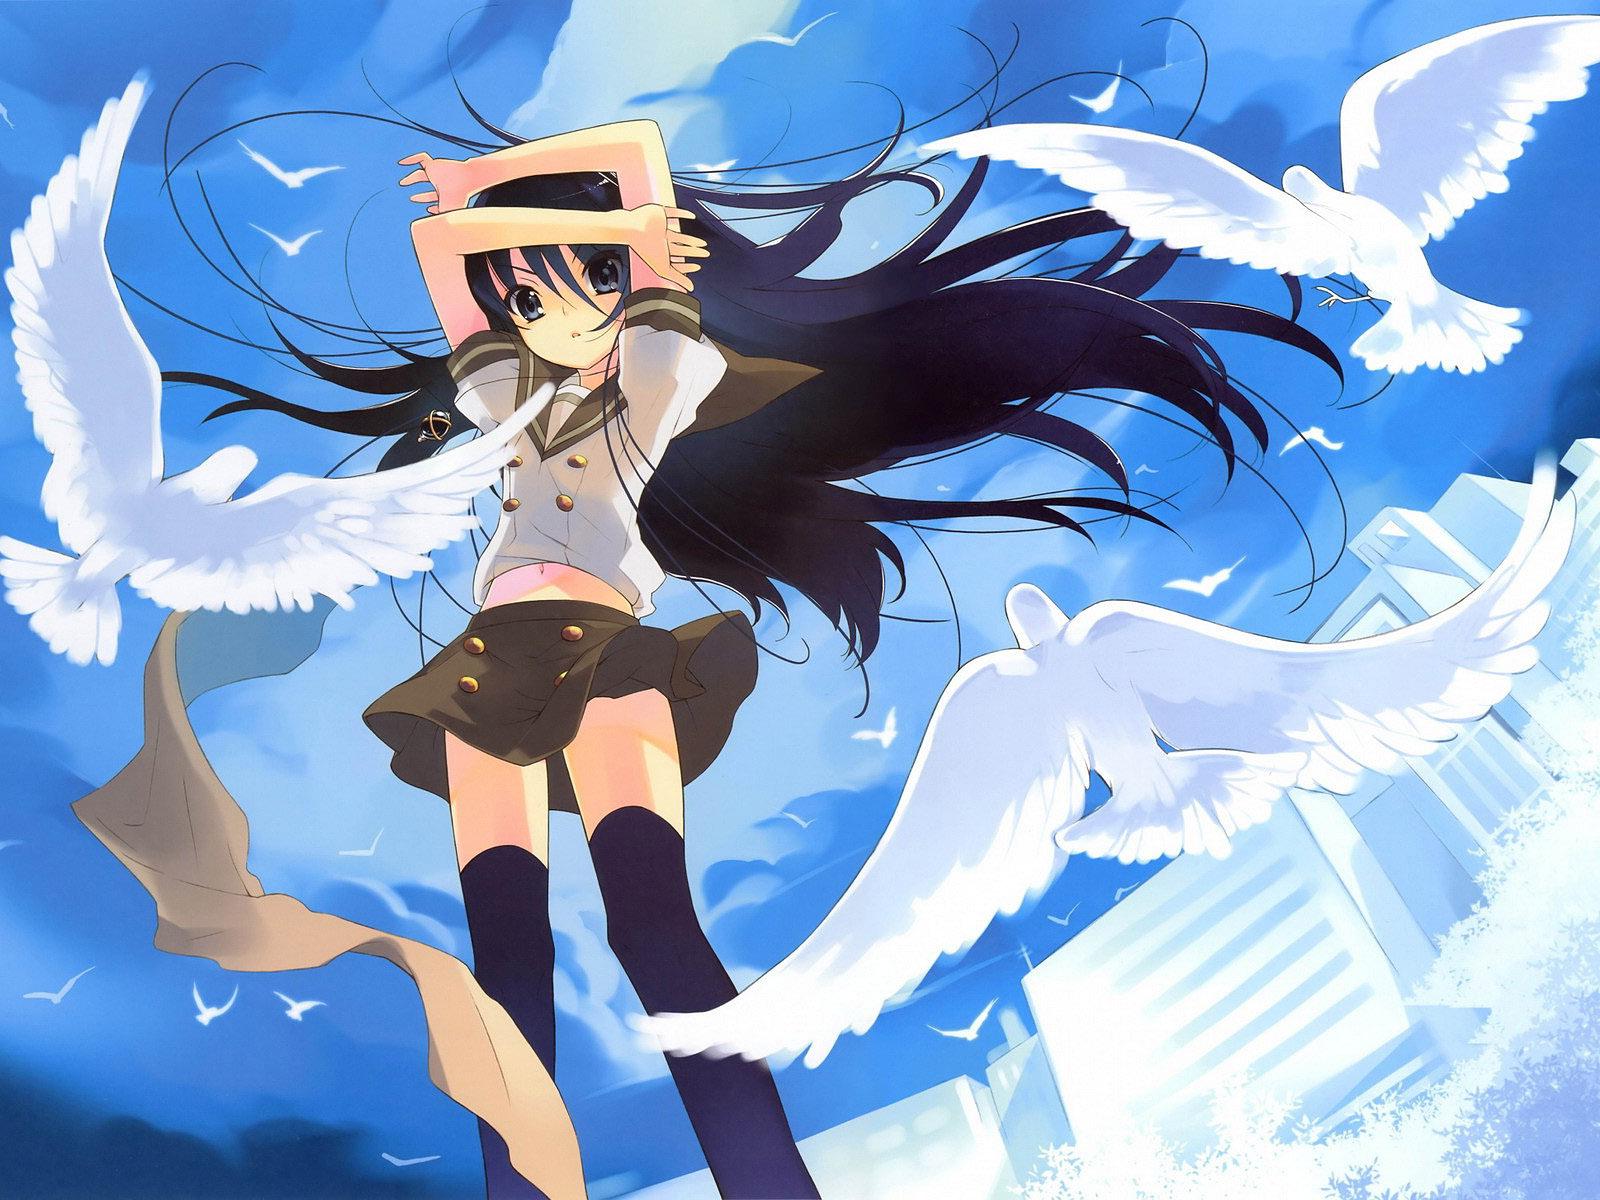 Im genes de chicas anime fondos de chicas anime wallpapers - Best anime picture hd ...